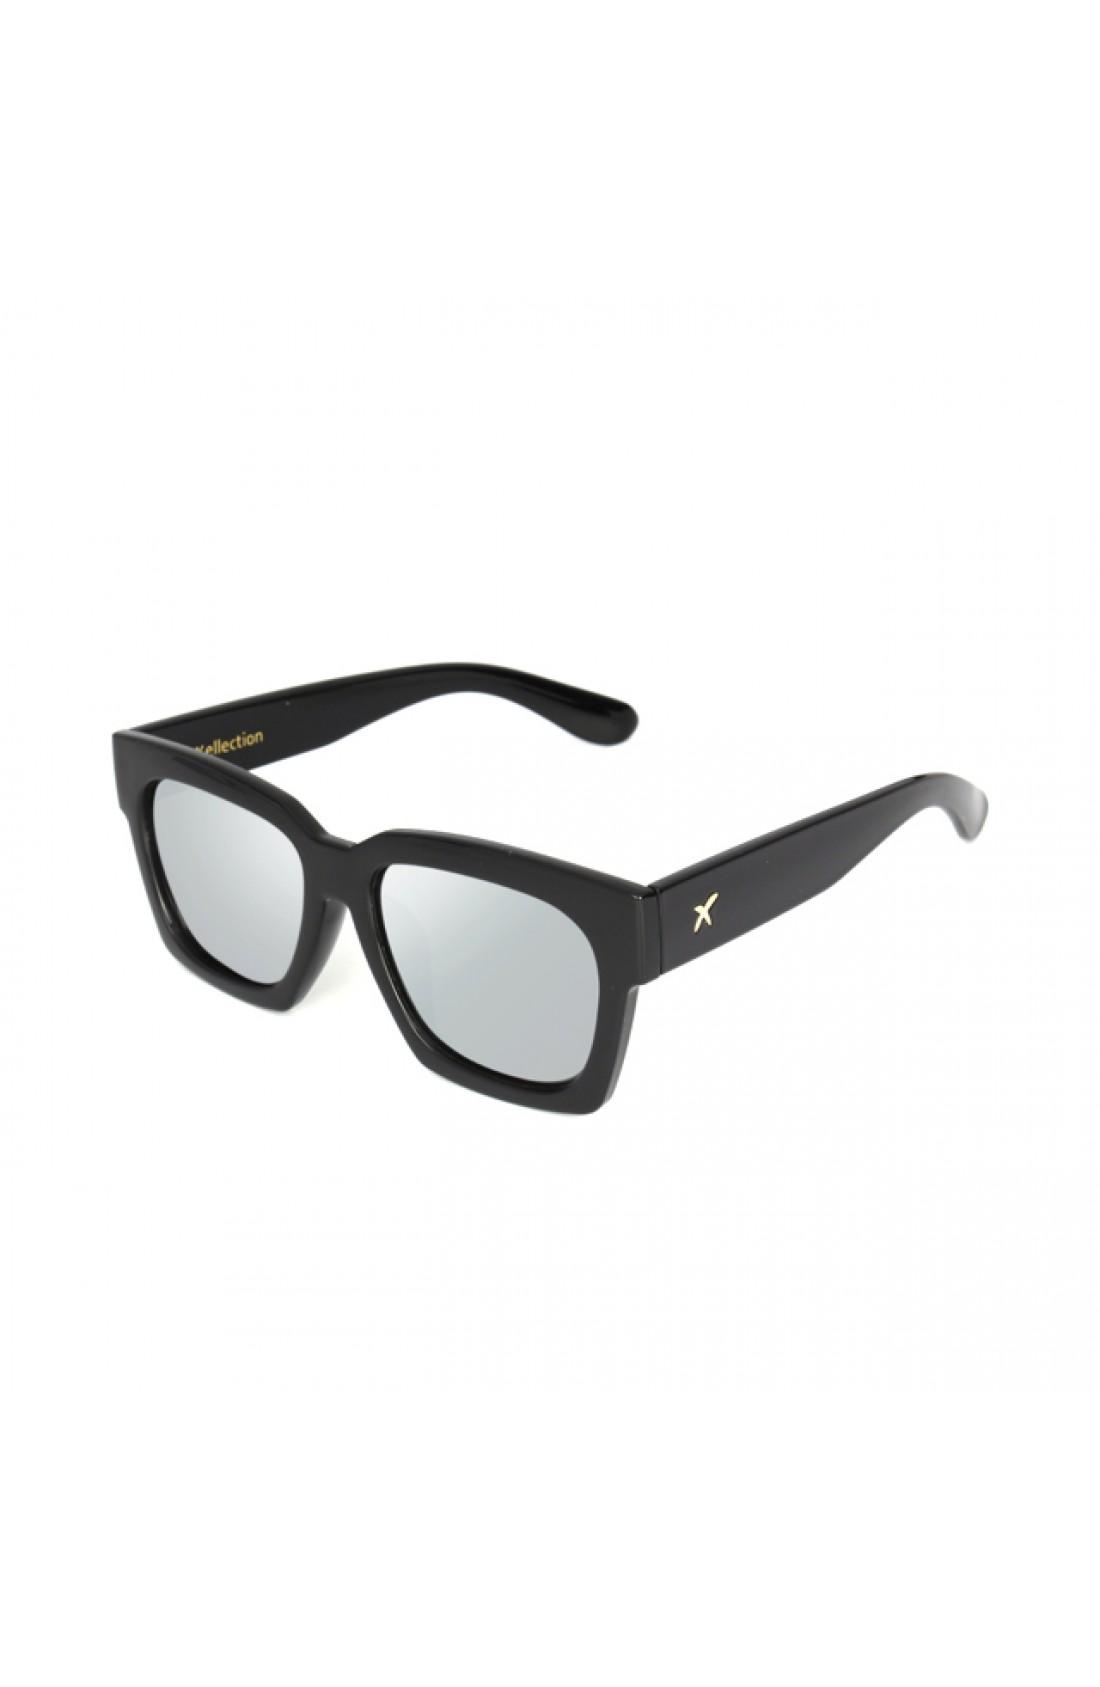 Sunglasses Style P01108_3